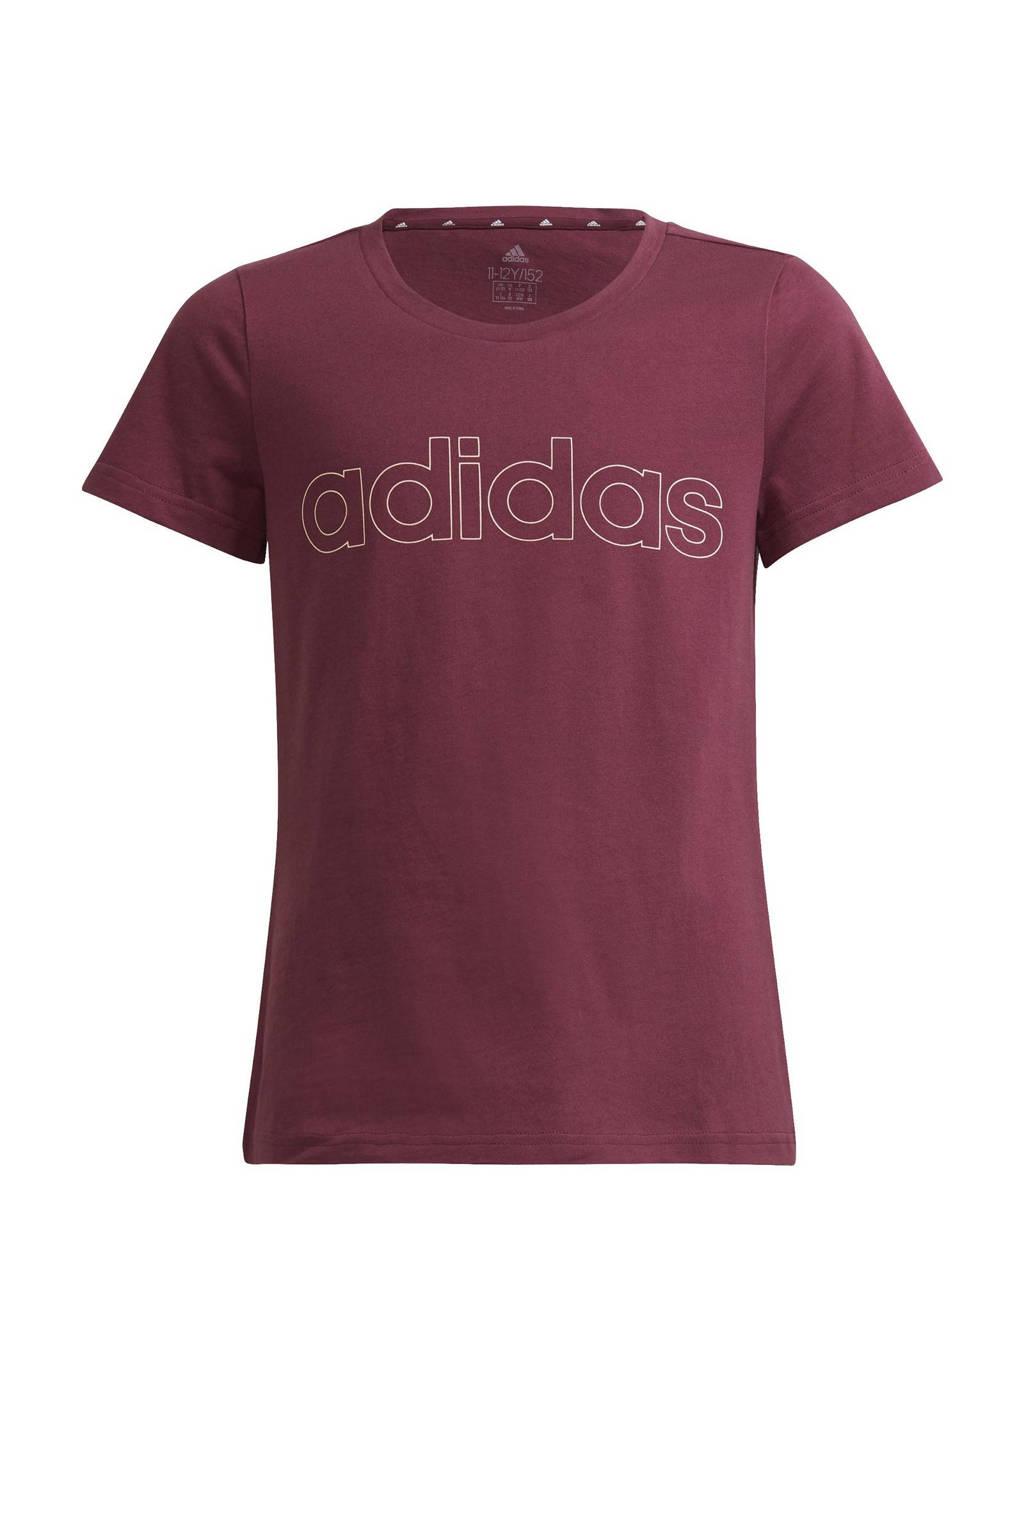 adidas Performance sport T-shirt donkerrood/lichtoranje